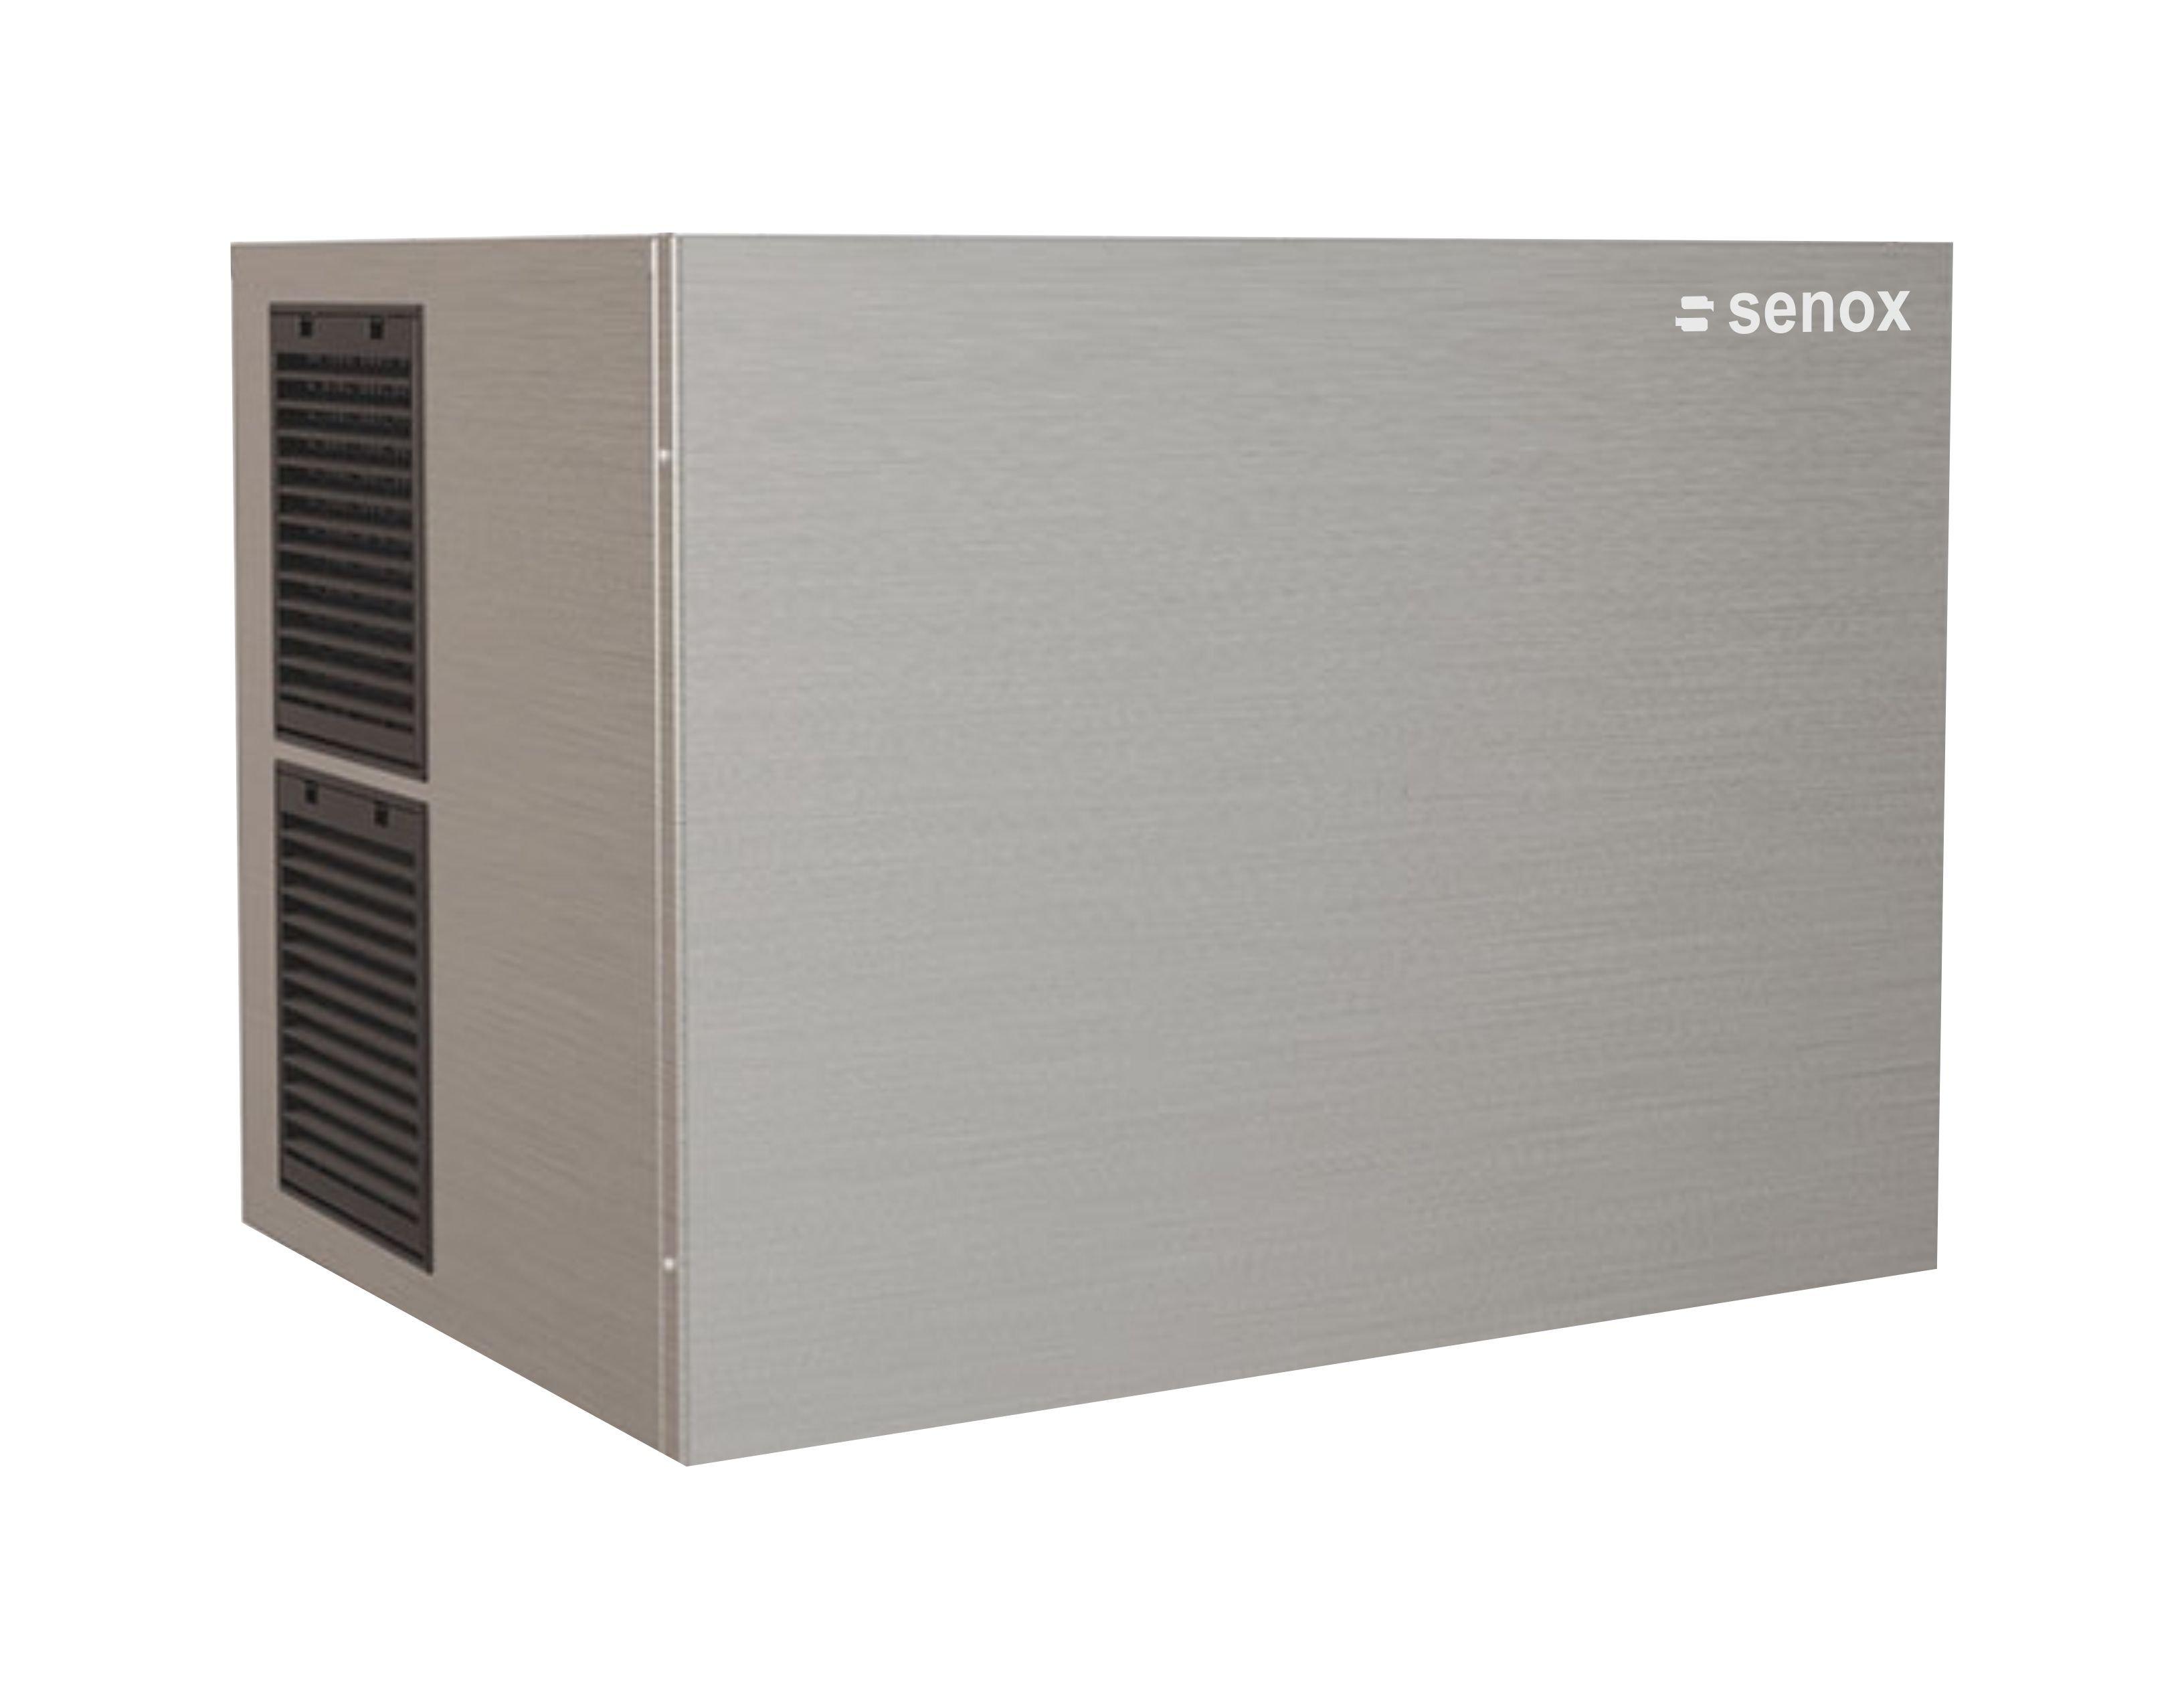 senox-fr-250